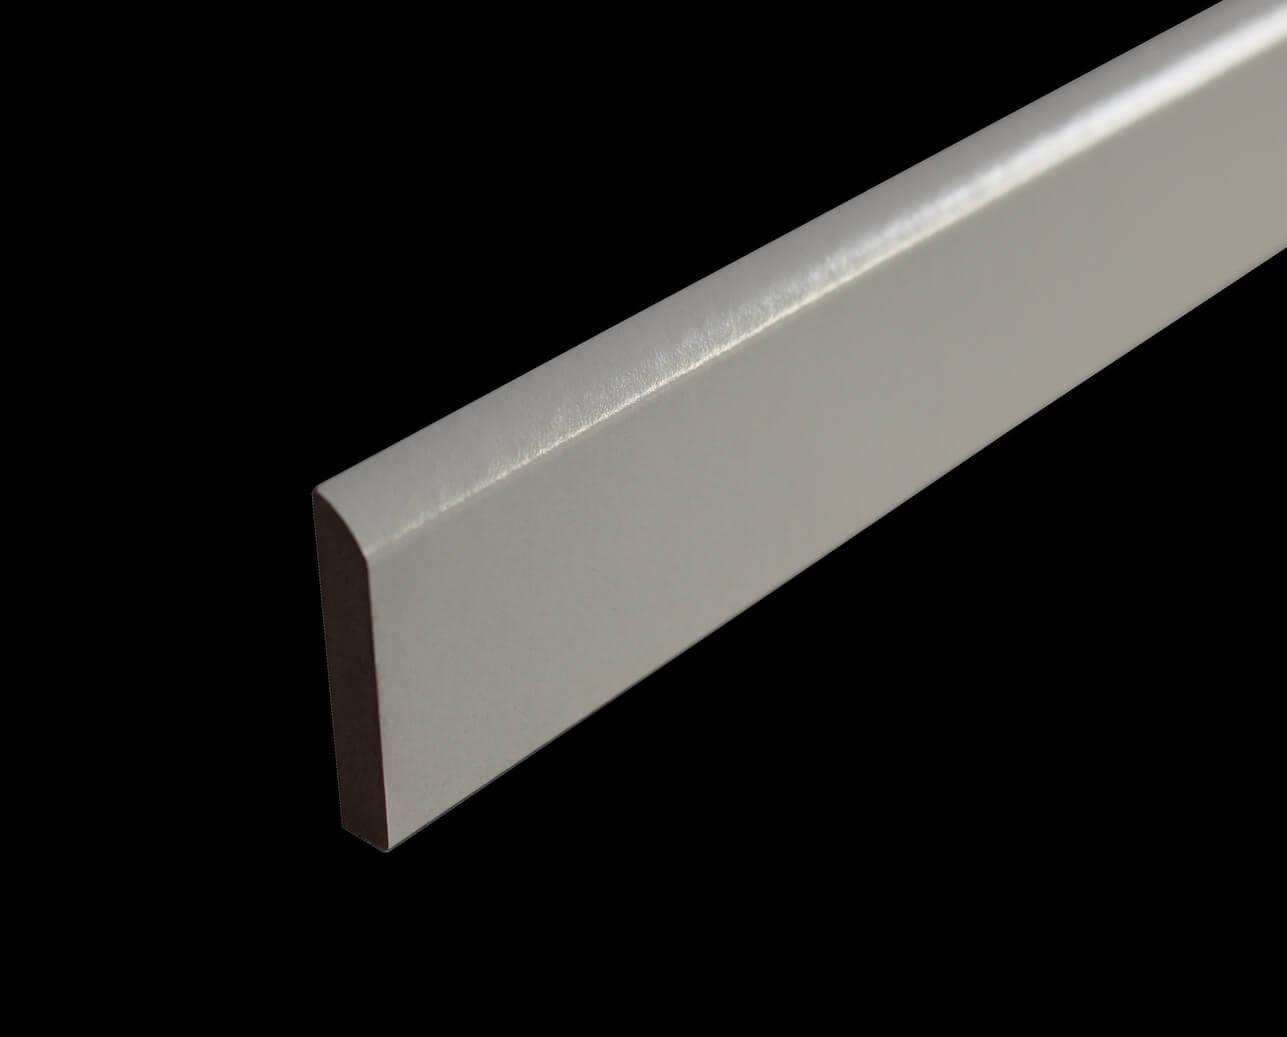 Plinthe Médium Mdf Revêtue Blanc 10 X 50 Mm 1 Bord Arrondi